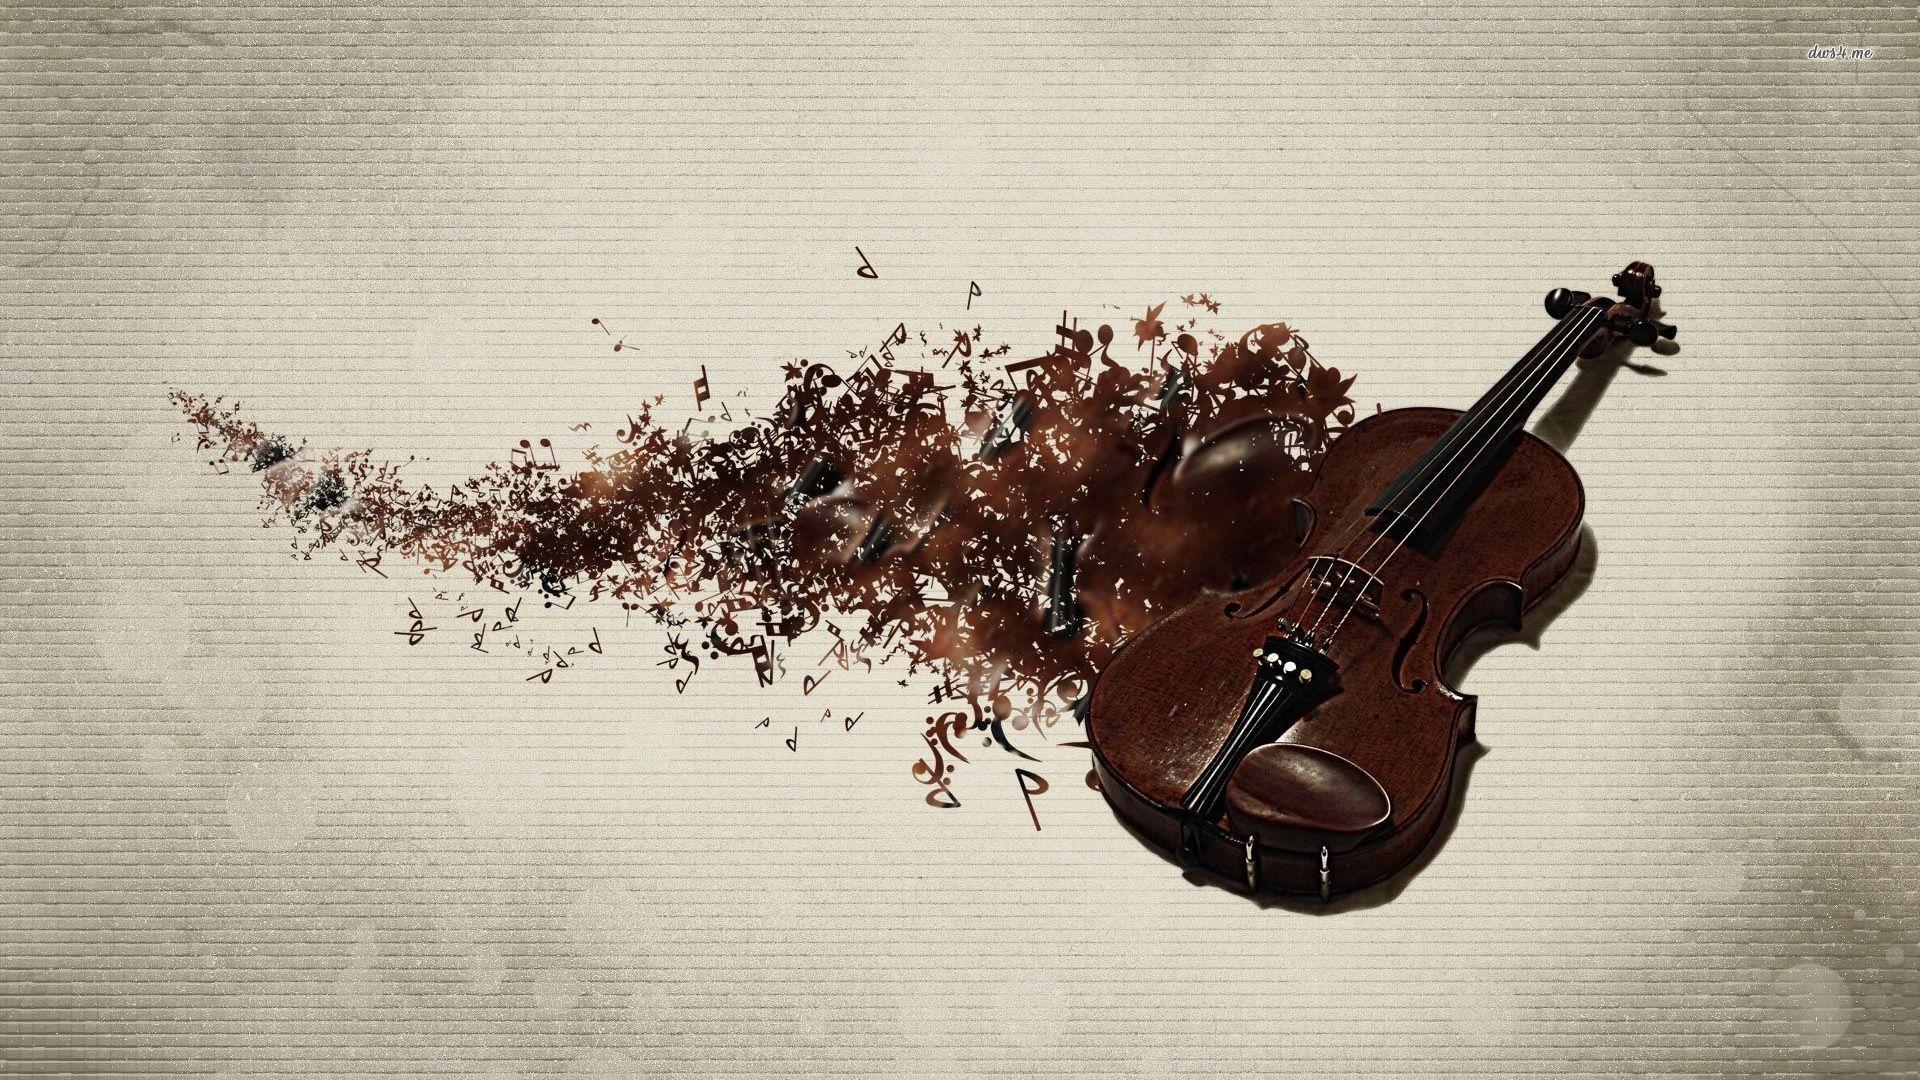 Violin wallpaper - Photography wallpapers - #